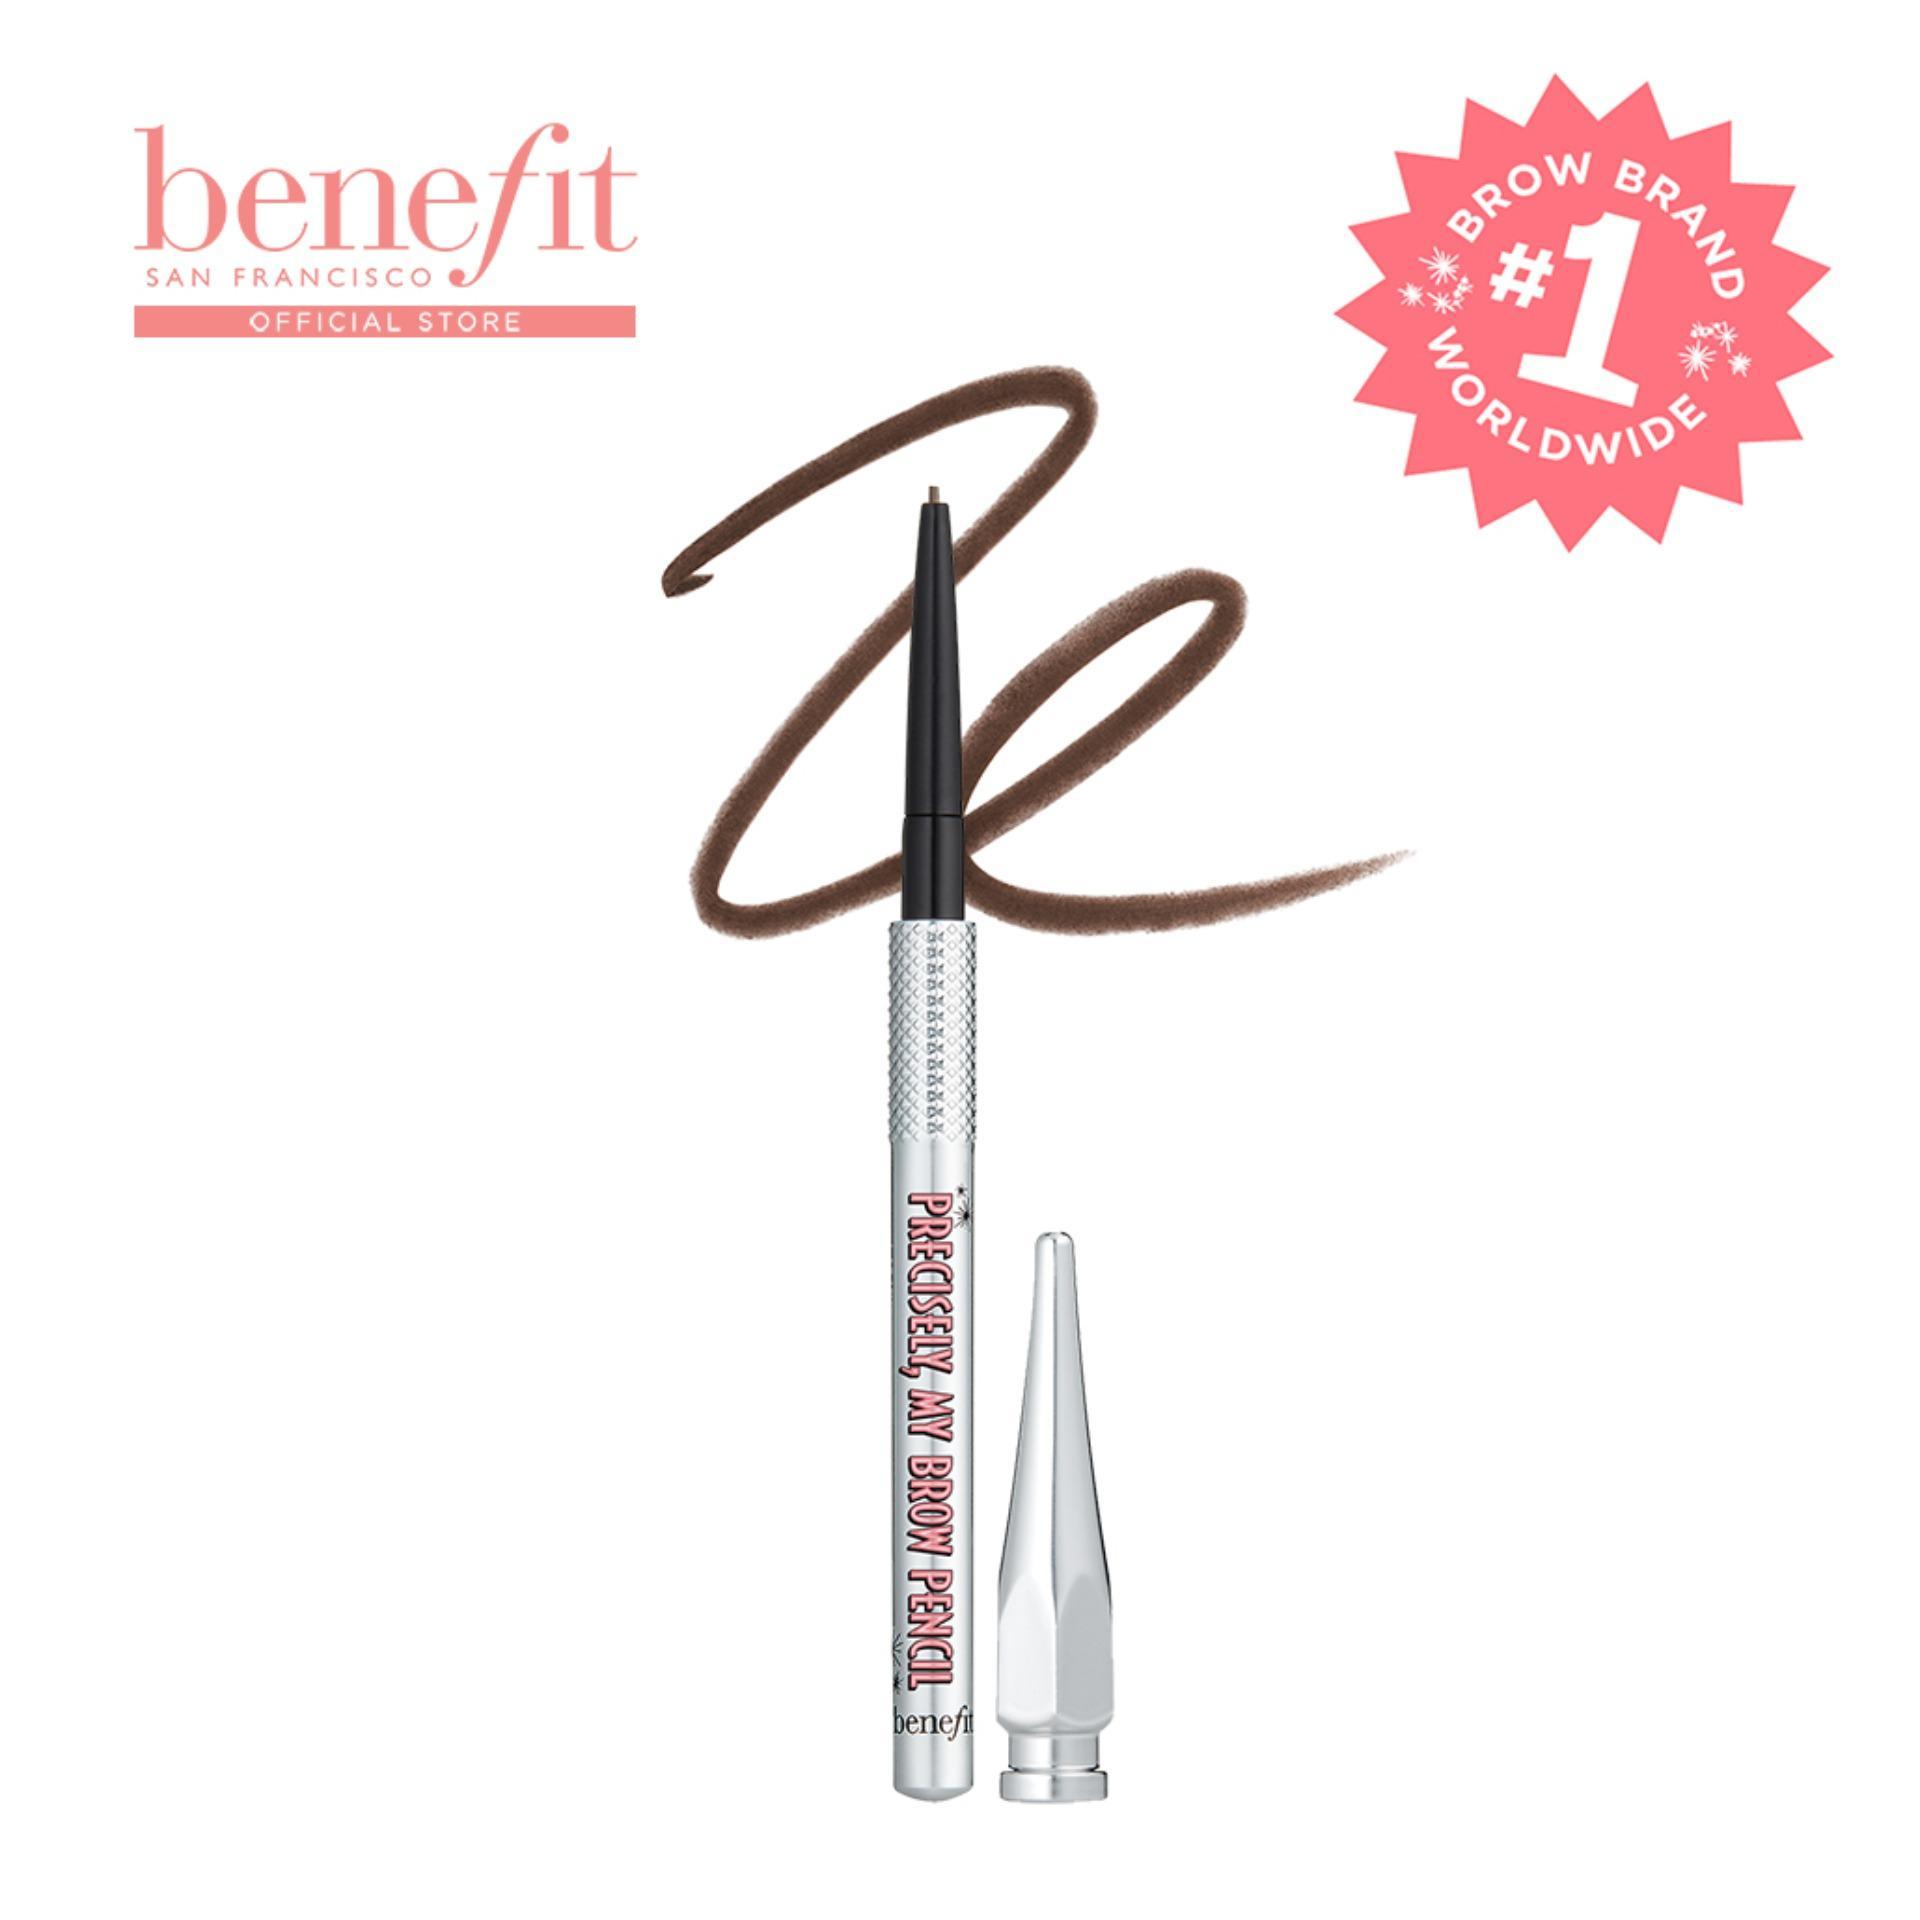 fdf2772ccdb Benefit Philippines: Benefit price list - Makeup & Eye Cream for ...